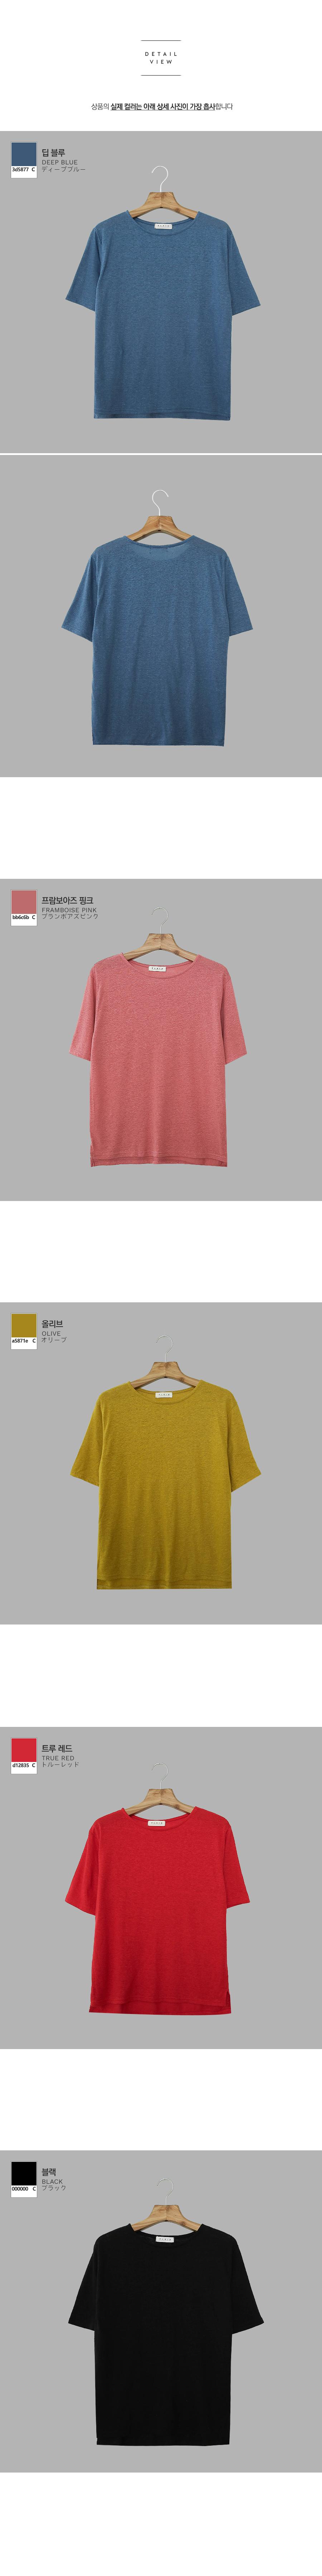 PBP. Linen Basic Short Sleeve Tee